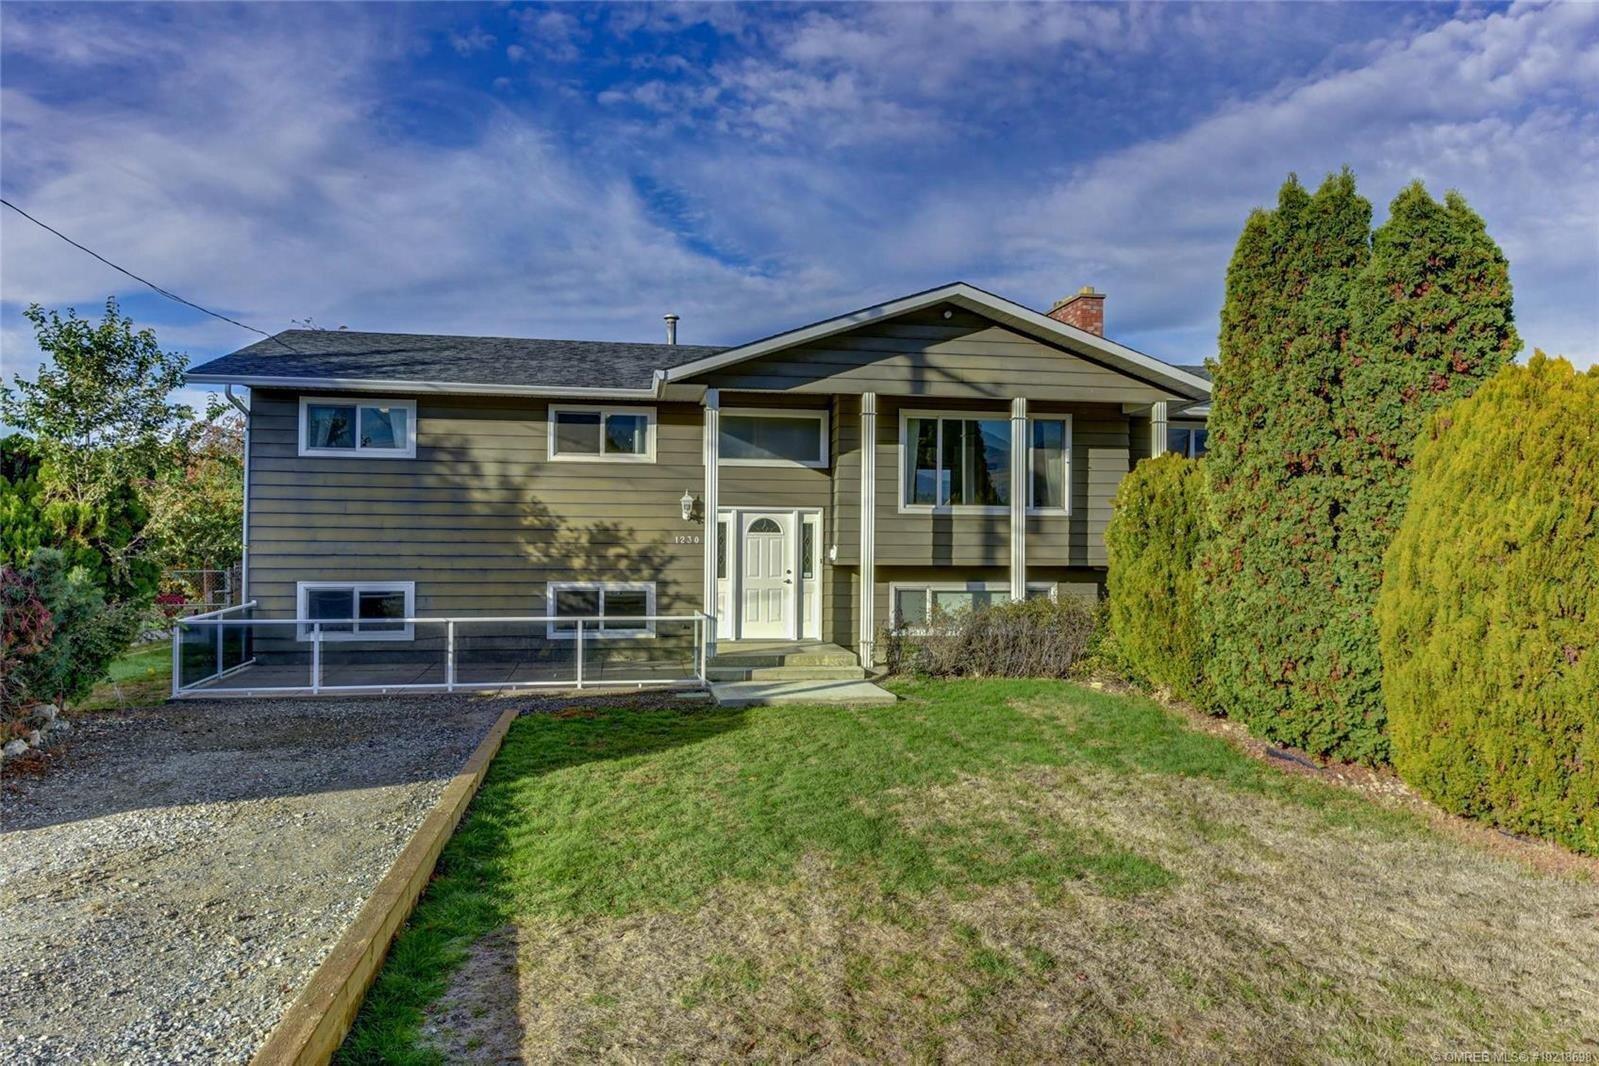 House for sale at 1230 Ortt Rd Kelowna British Columbia - MLS: 10218698